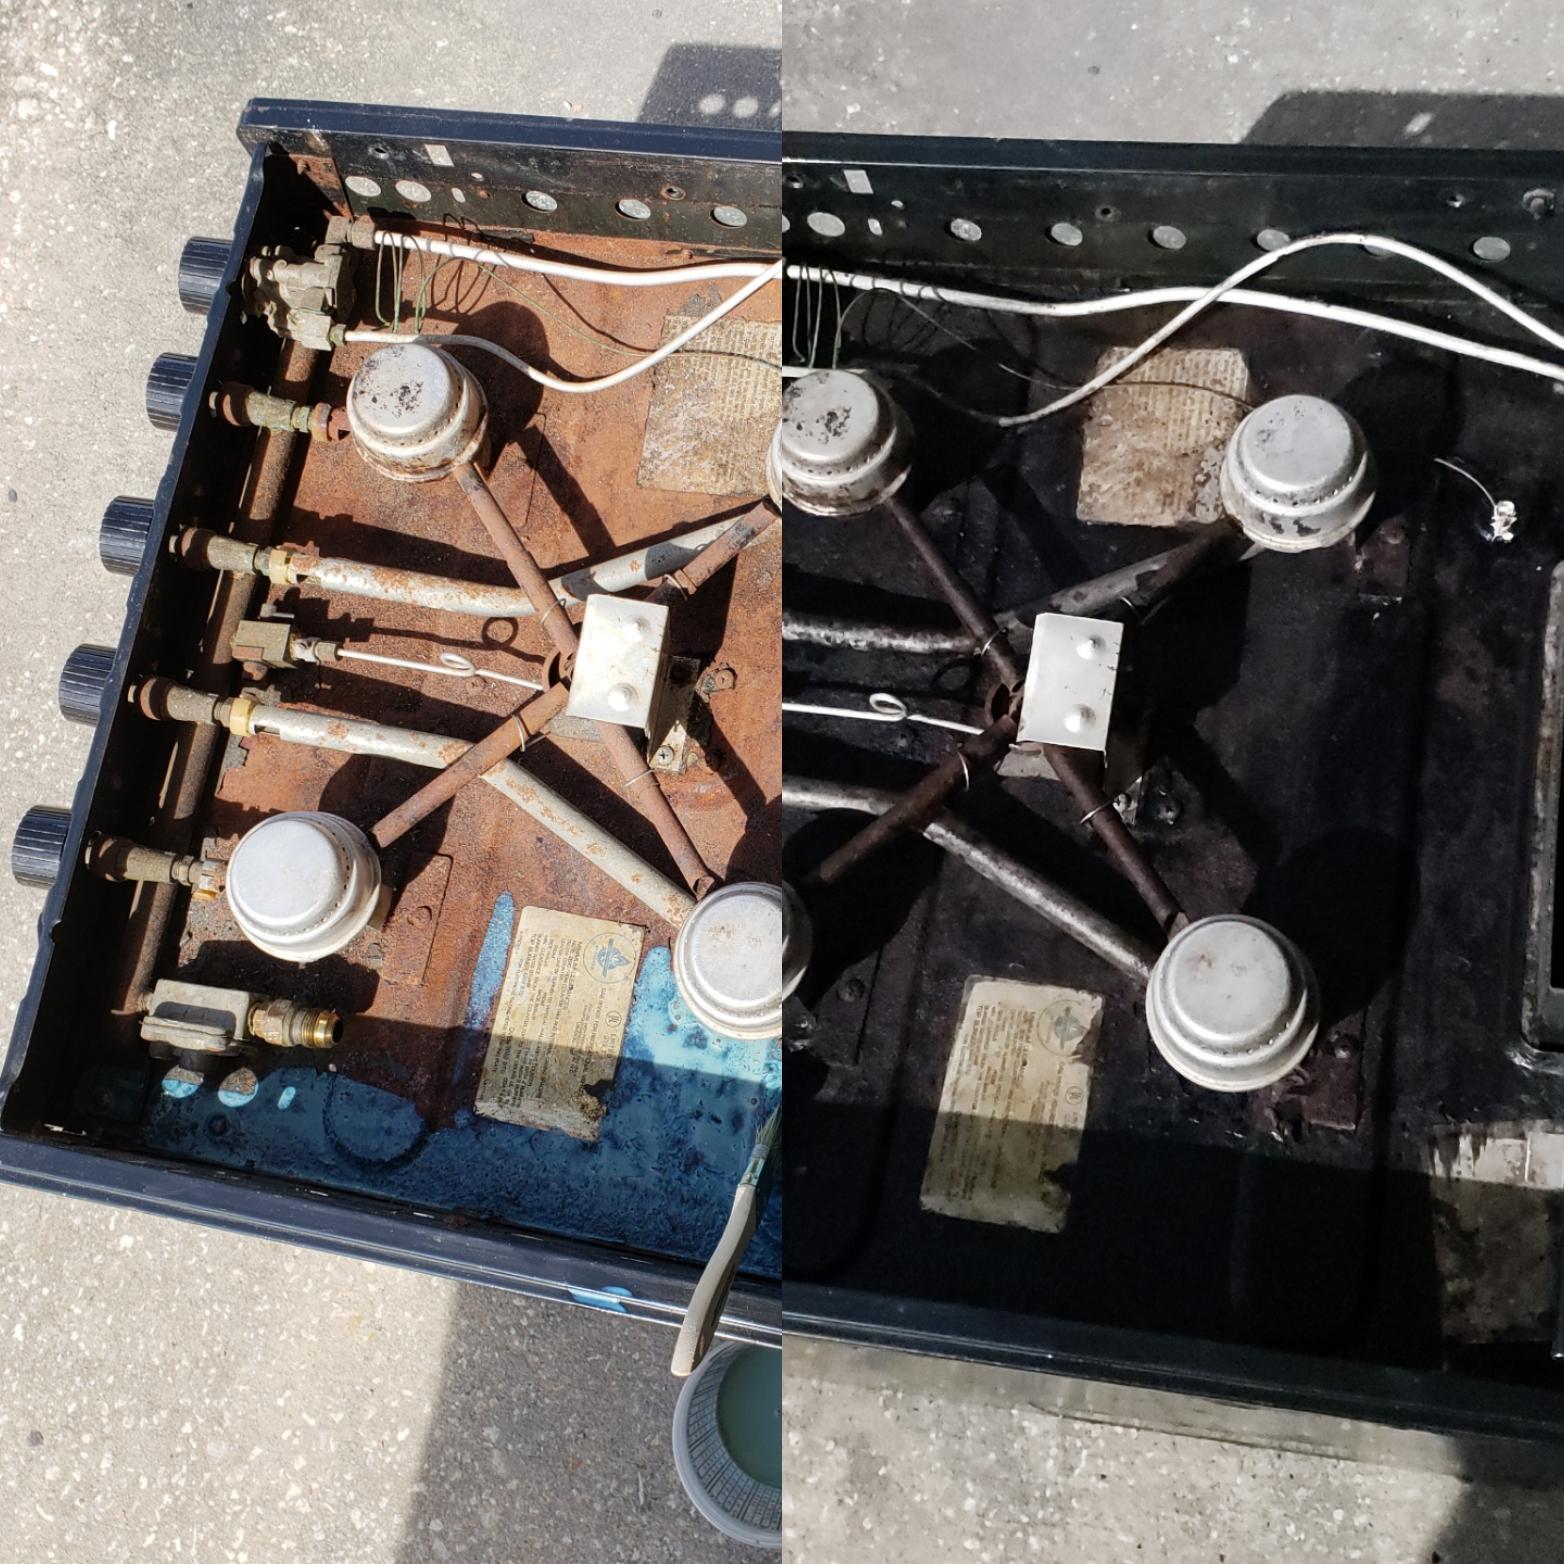 RV Restoration - Oven